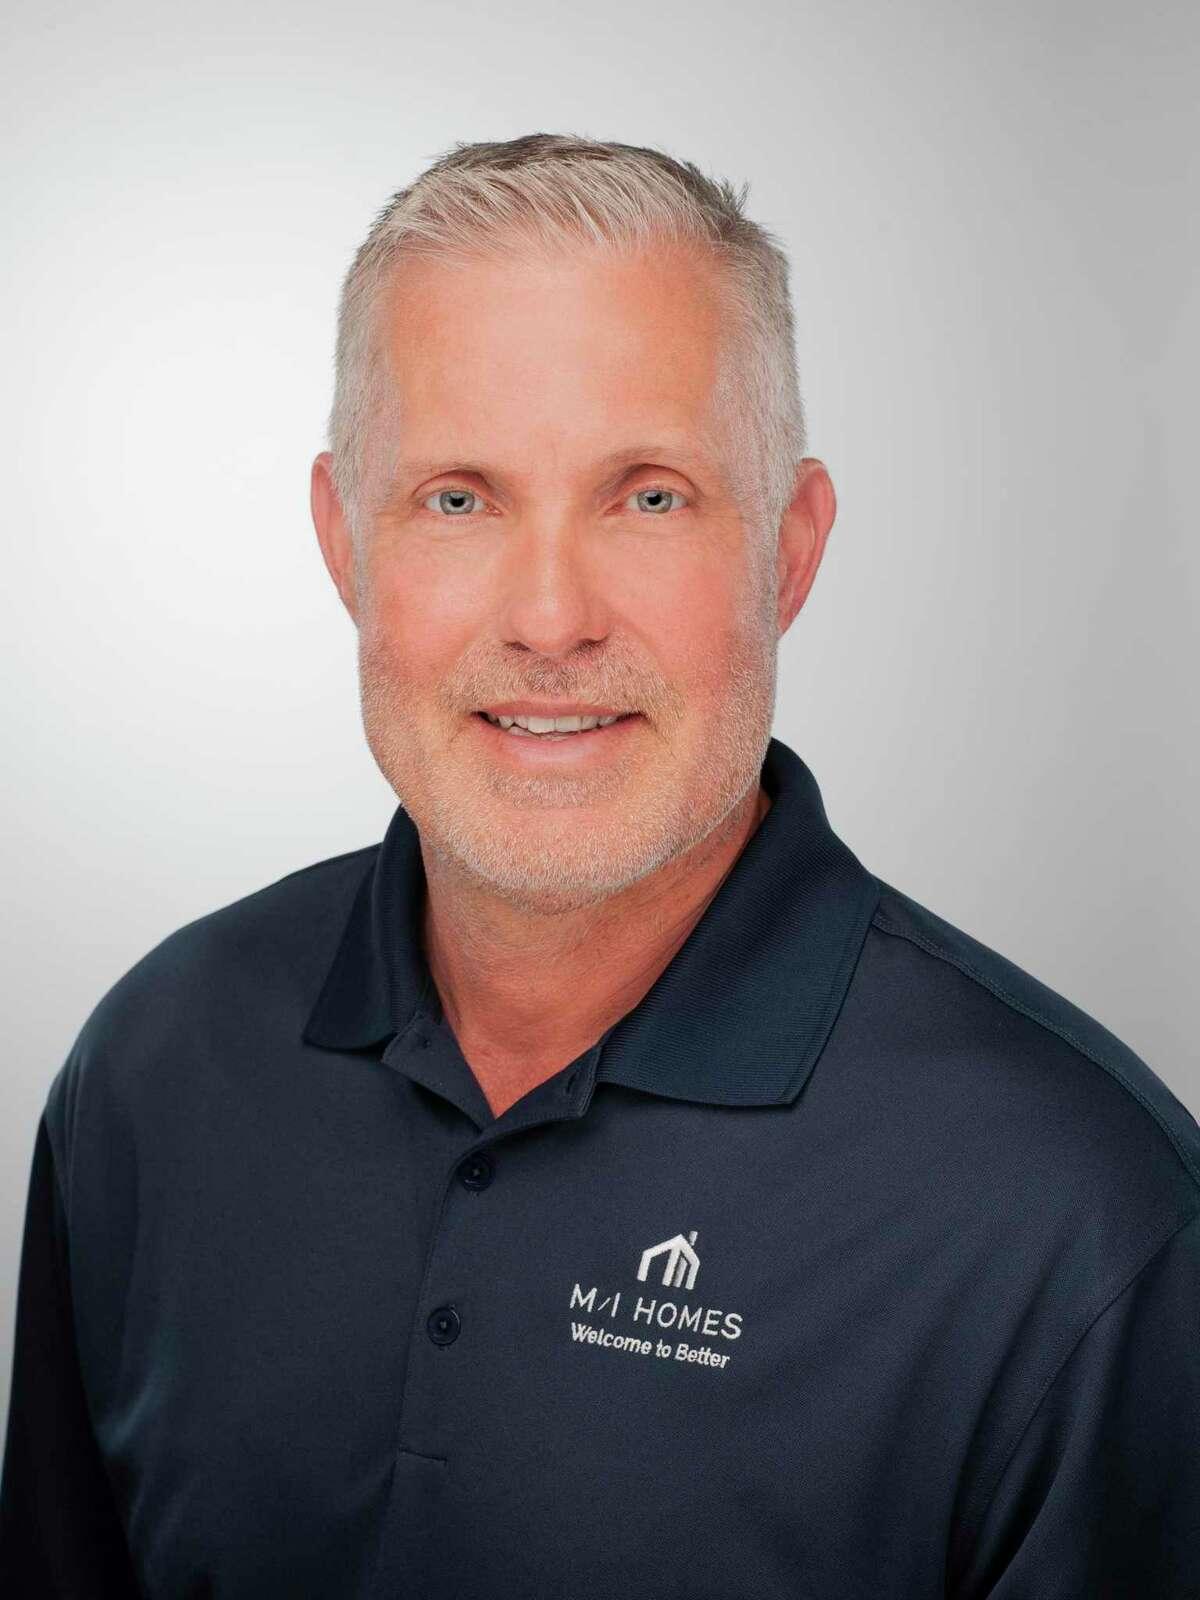 Jay McManus is Houston division president for M/I Homes.